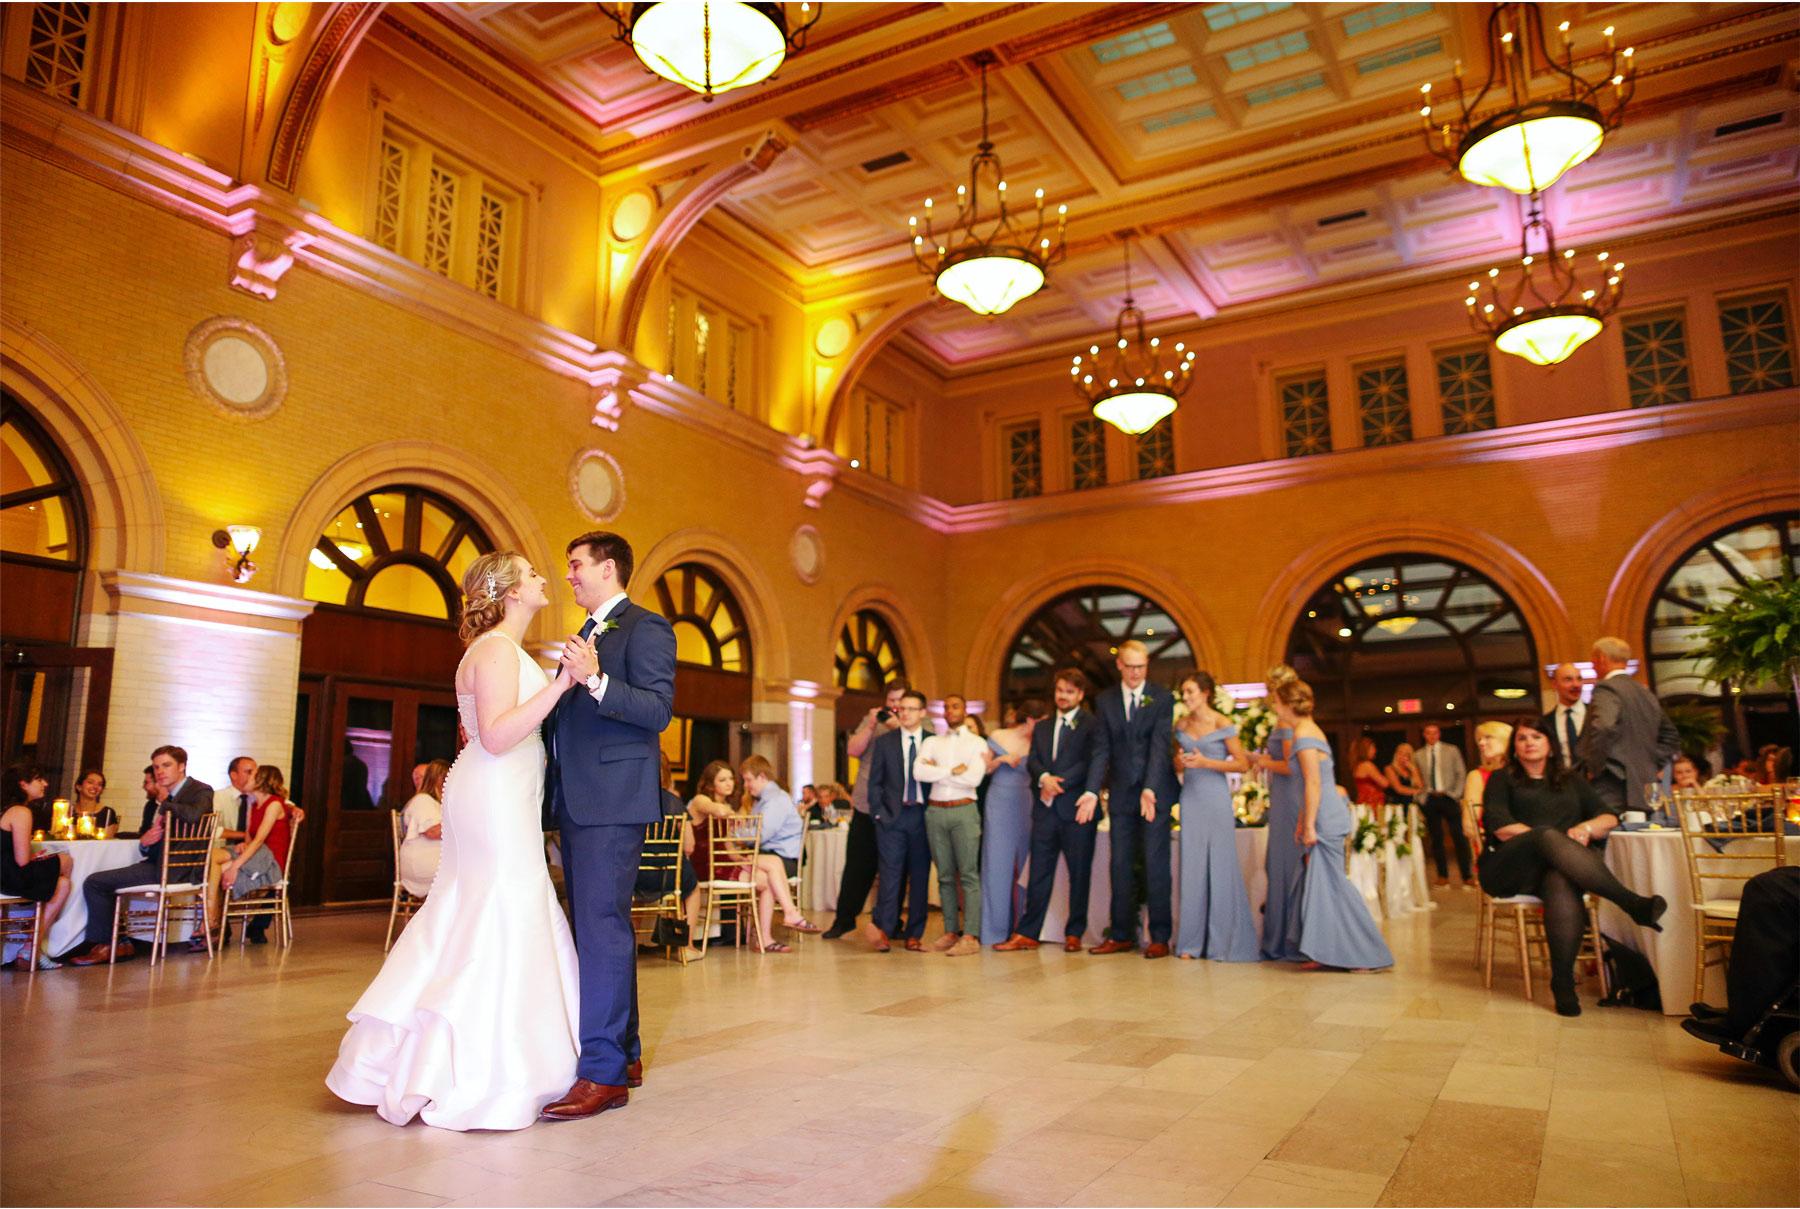 21-Minneapolis-Minnesota-Wedding-Vick-Photography-The-Depot-Reception-First-Dance-Amelia-and-Alexander.jpg